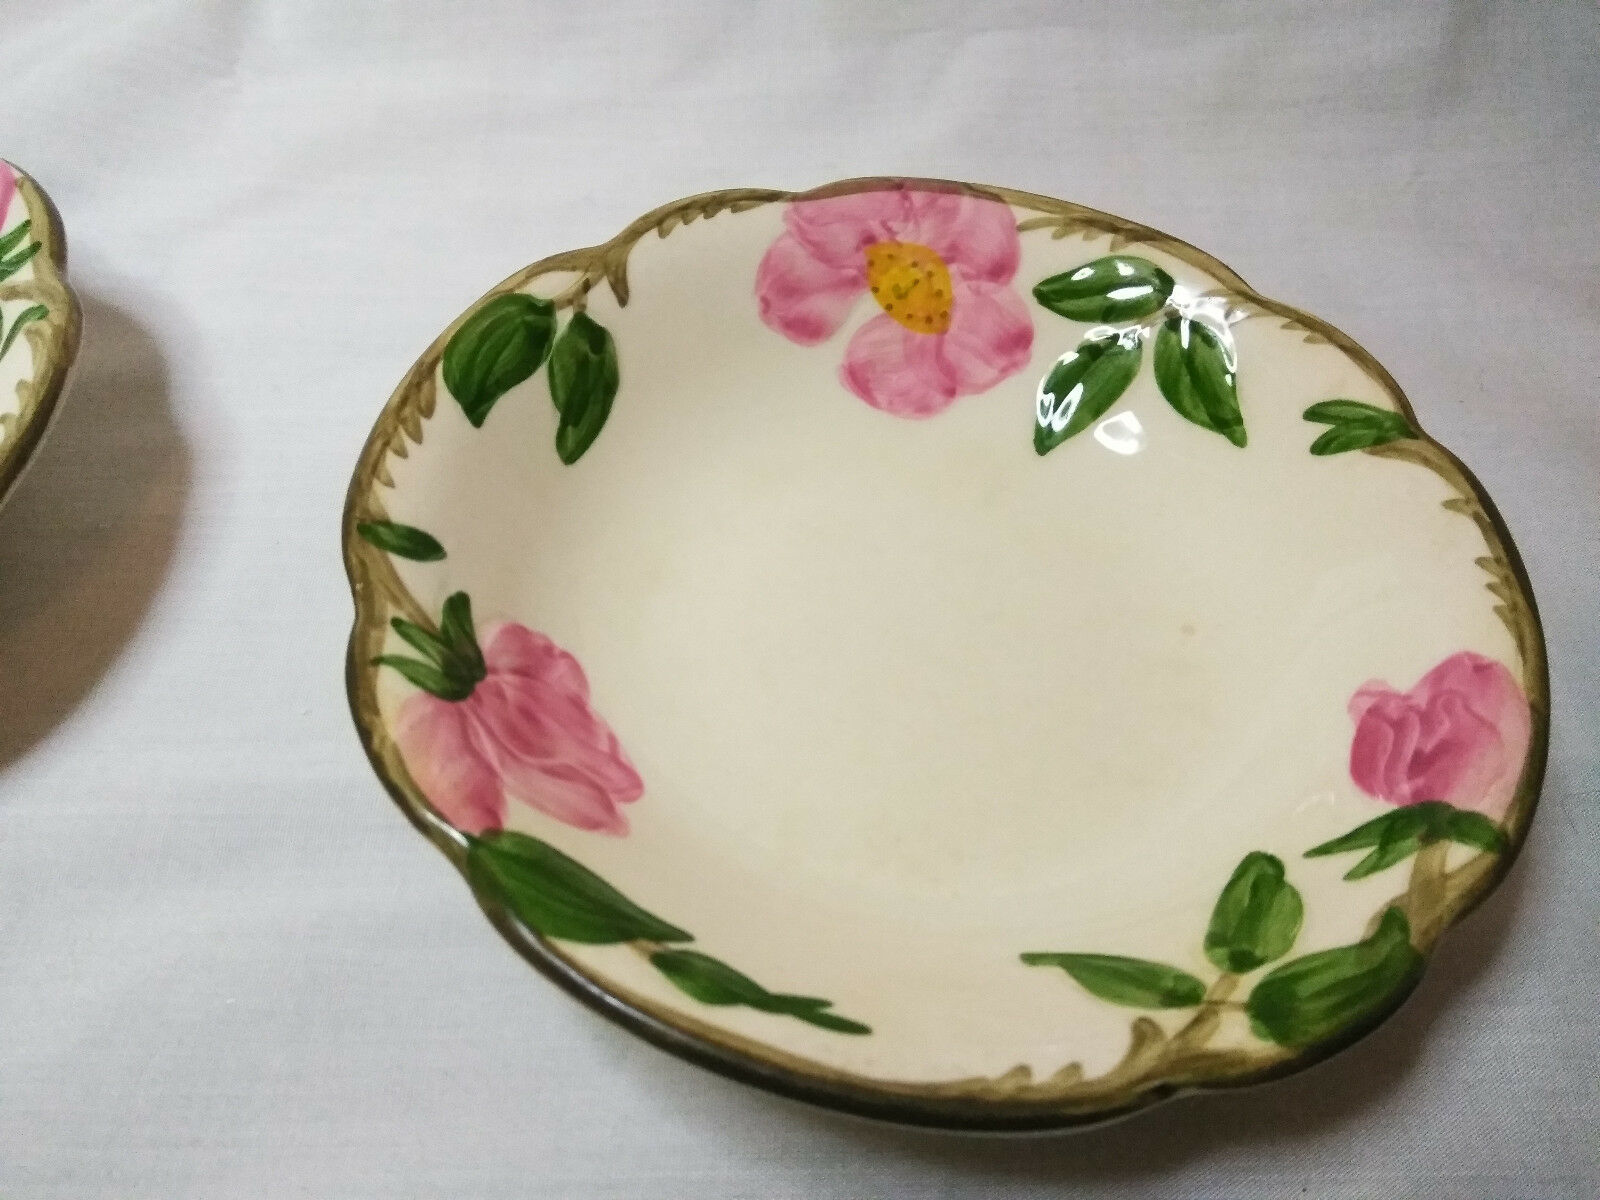 Vintage Franciscan China Set of 2 Small finger/ Ice cream bowls  Desert Rose